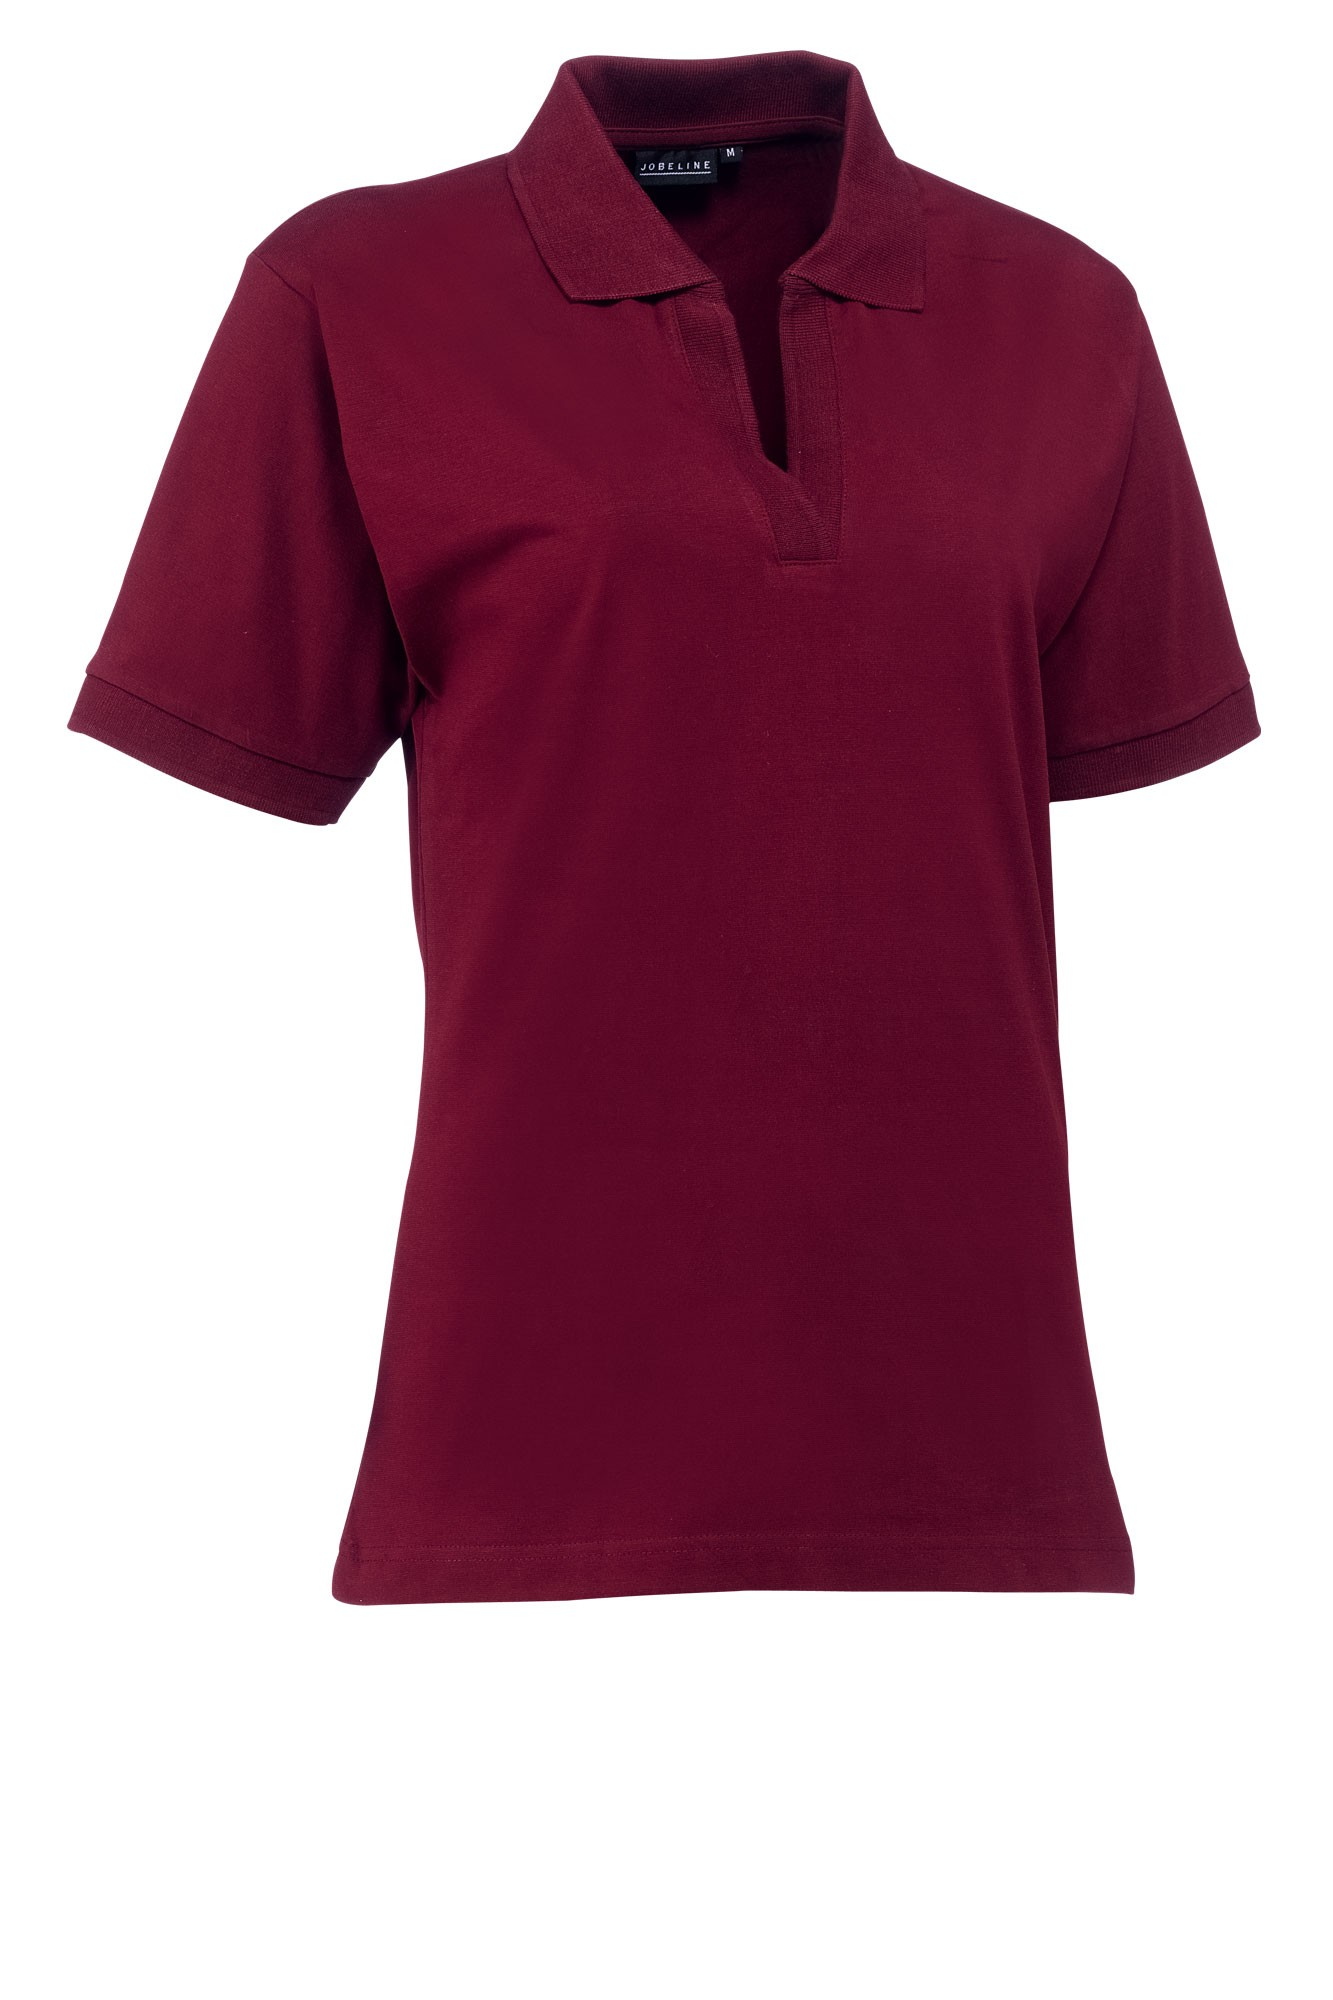 Dámské tričko Benita - bordo